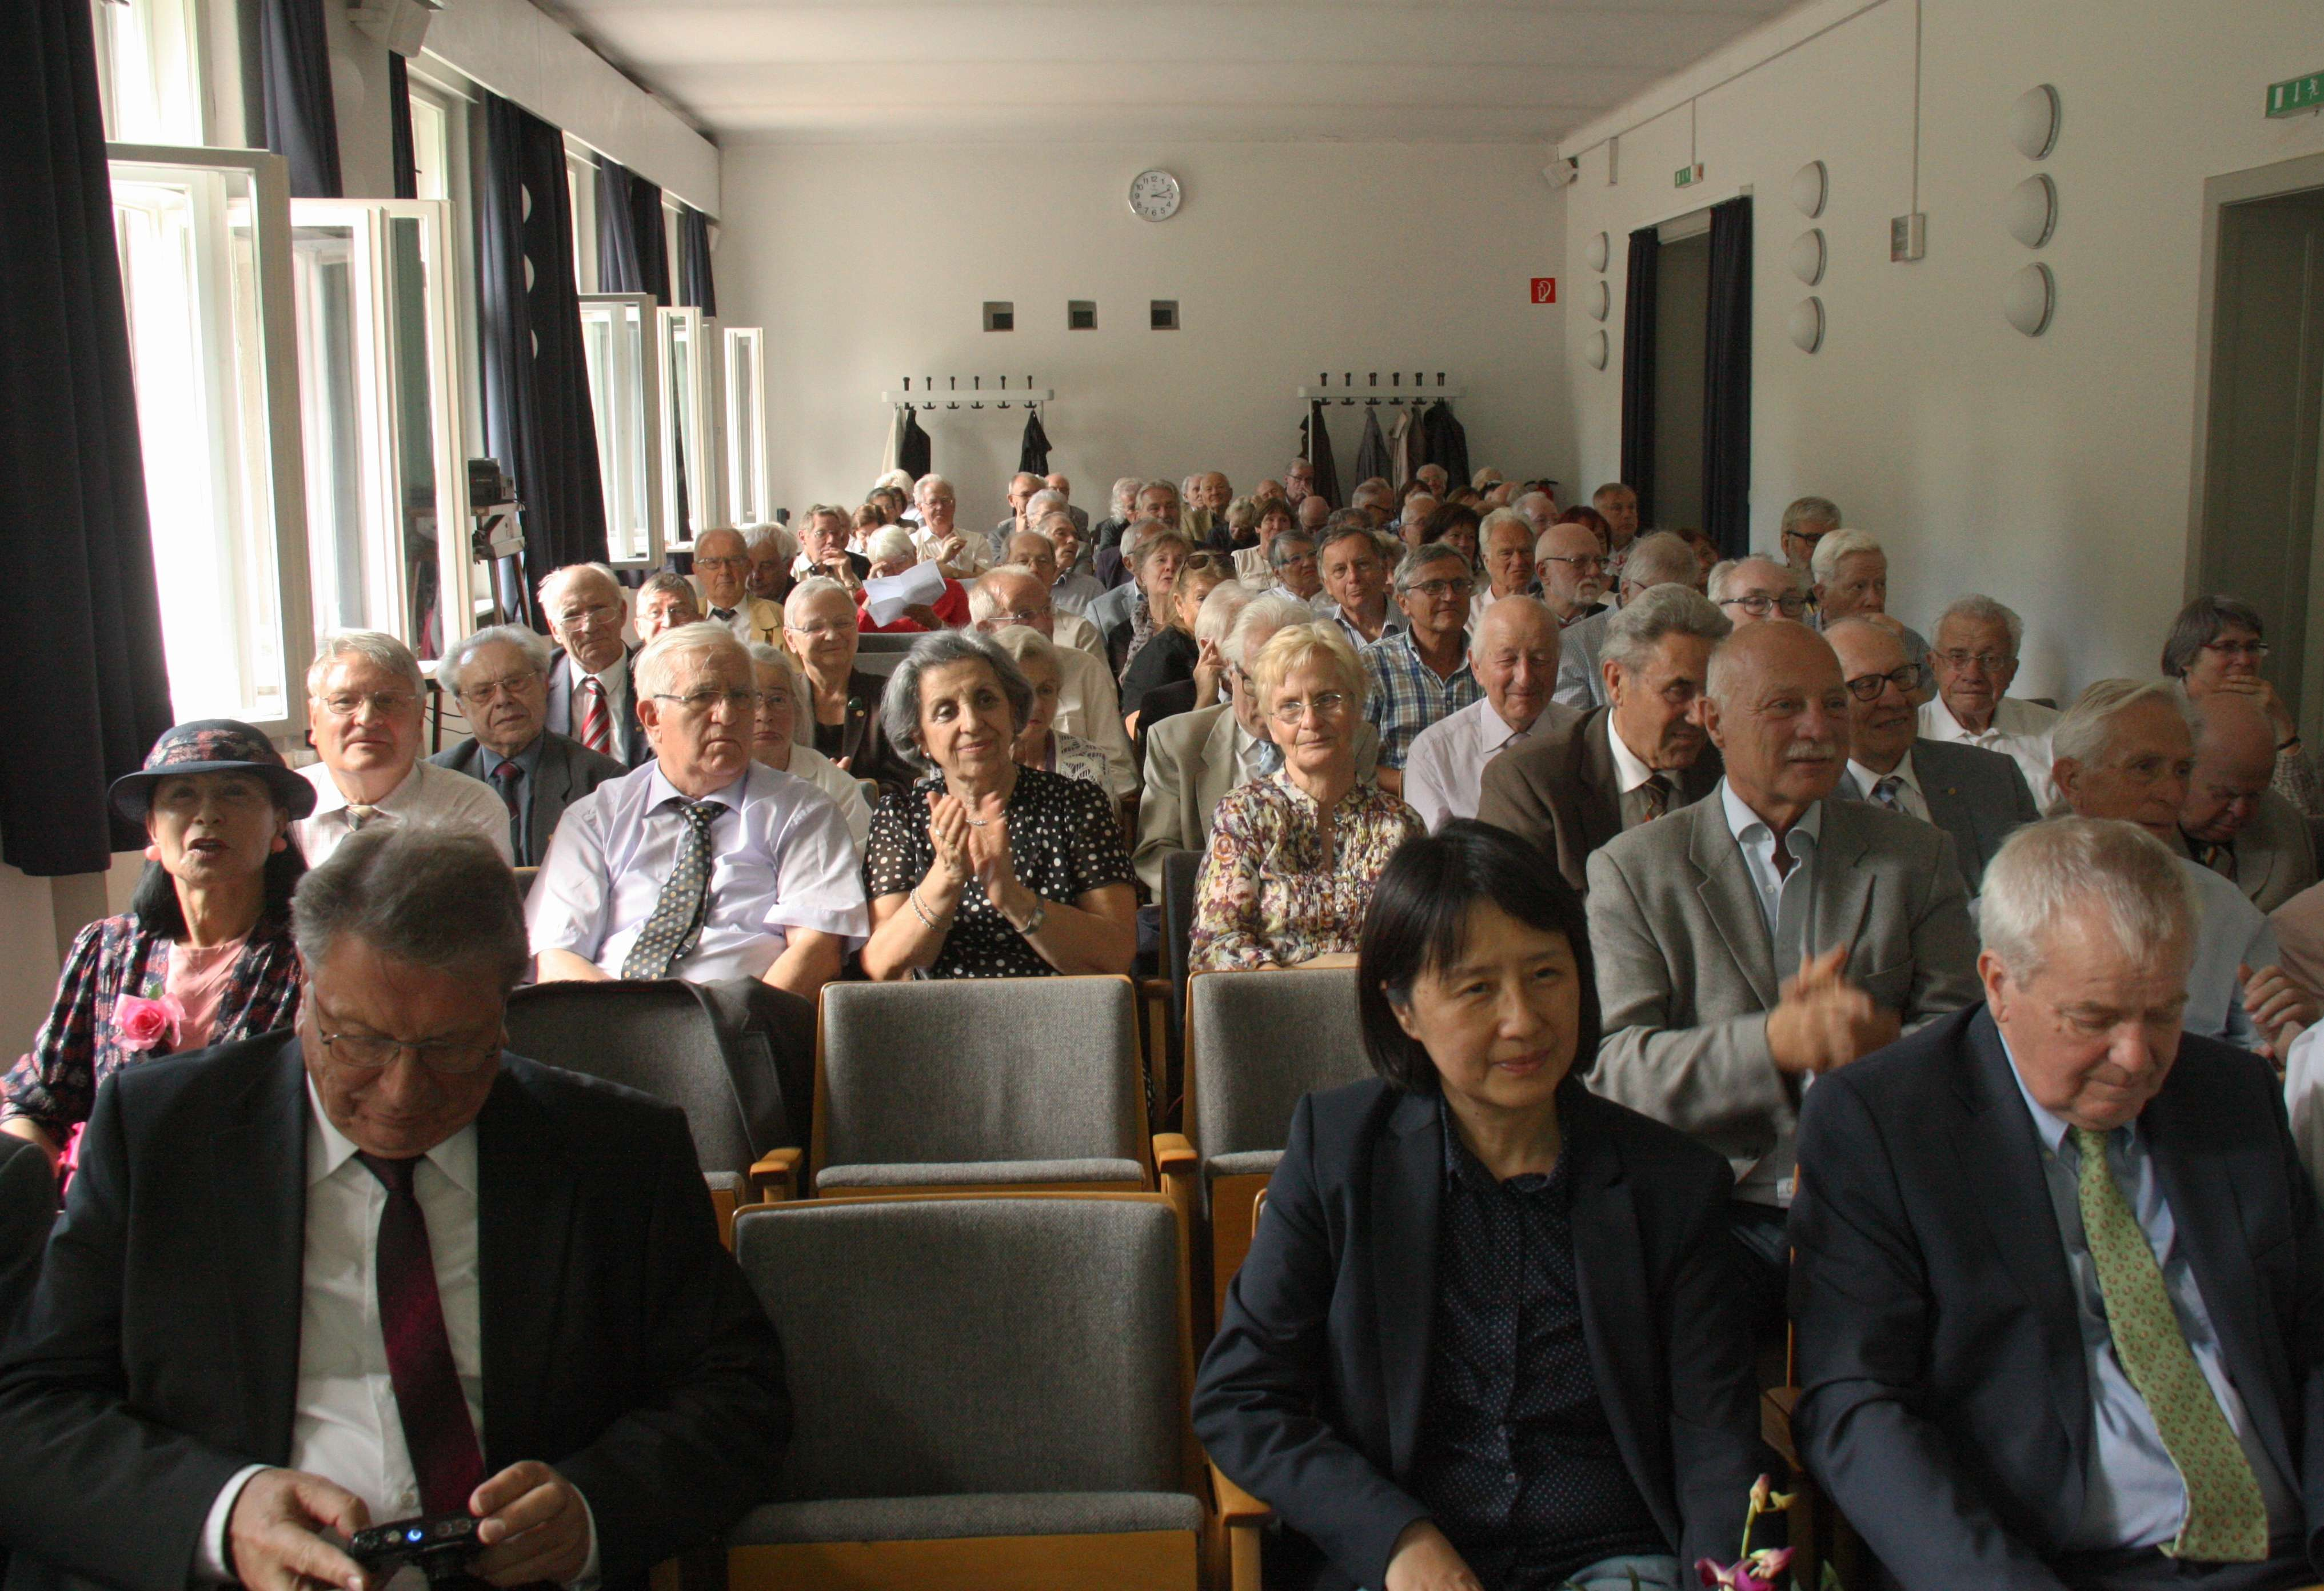 LT2016 Blick in das Plenum; Foto: D. Linke